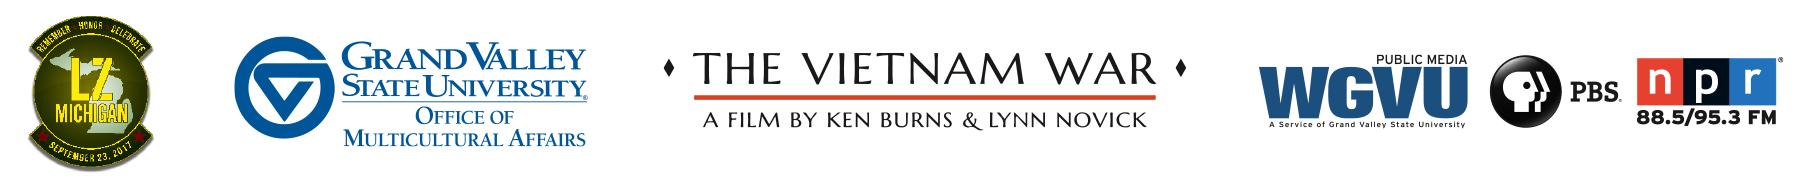 LZ Michigan | Grand Valley State University | The Vietnam War by Ken Burns | WGVU Public Media